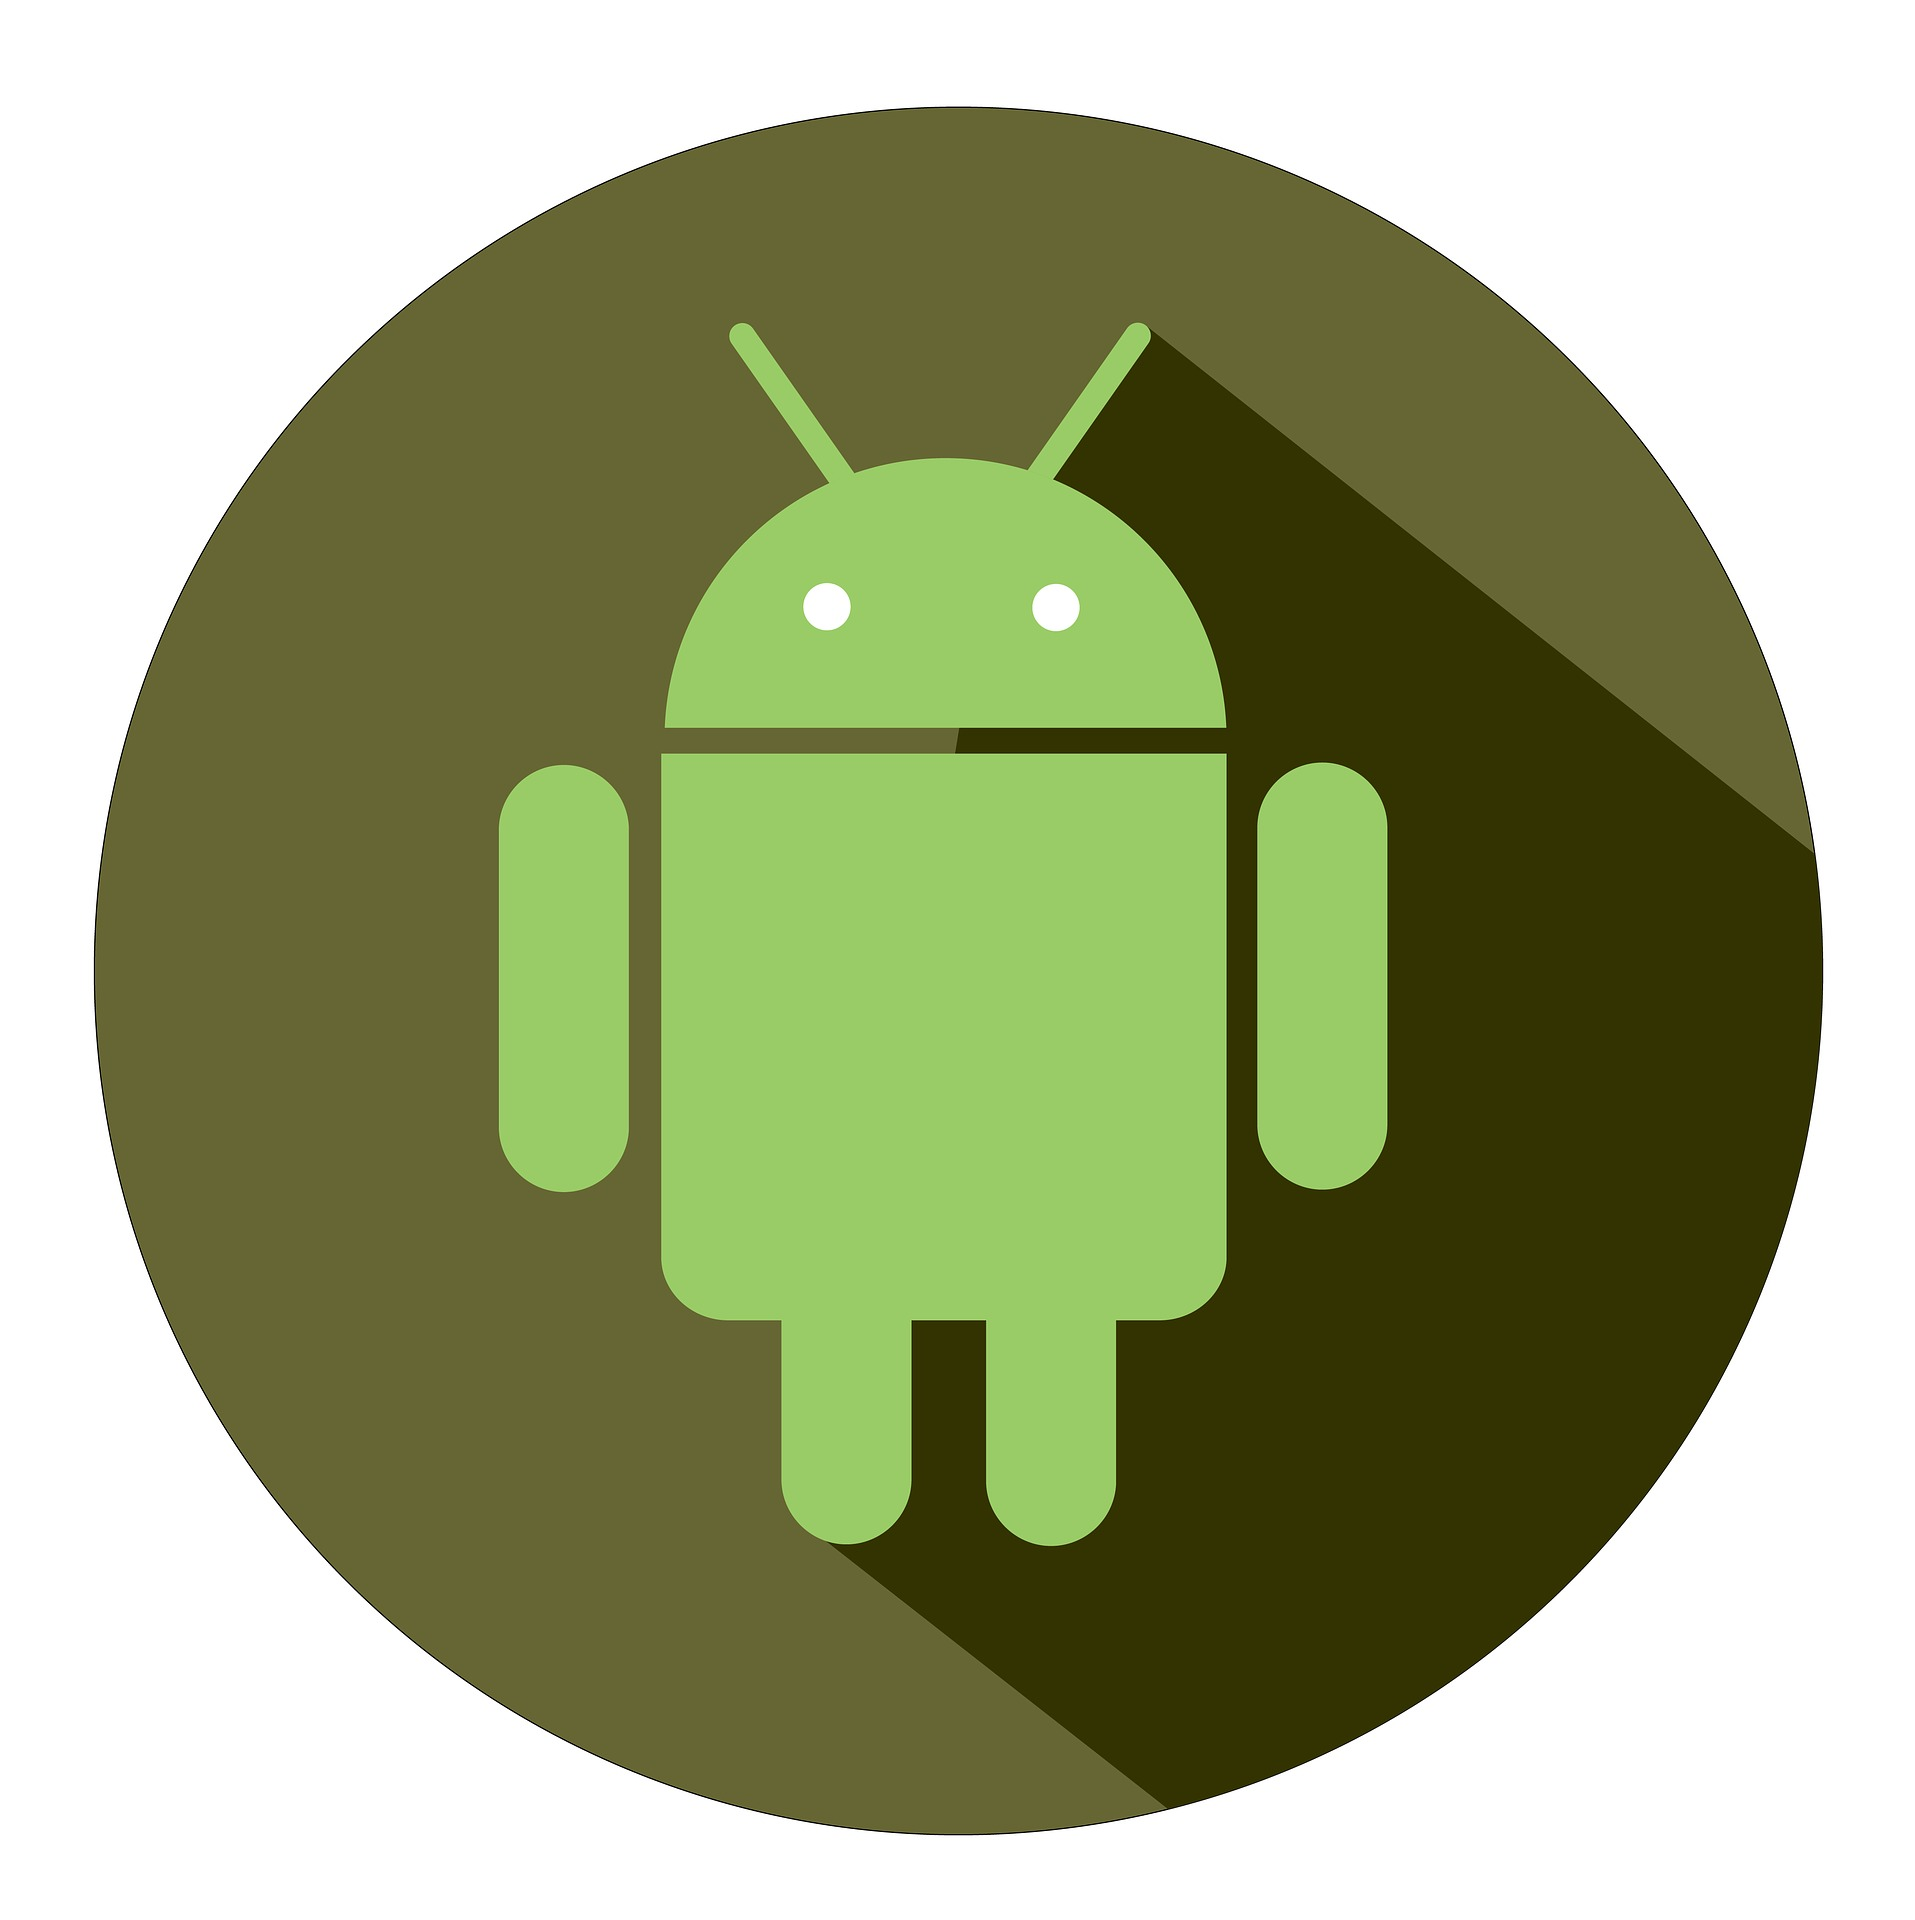 android icon pixabay free image CC0 2